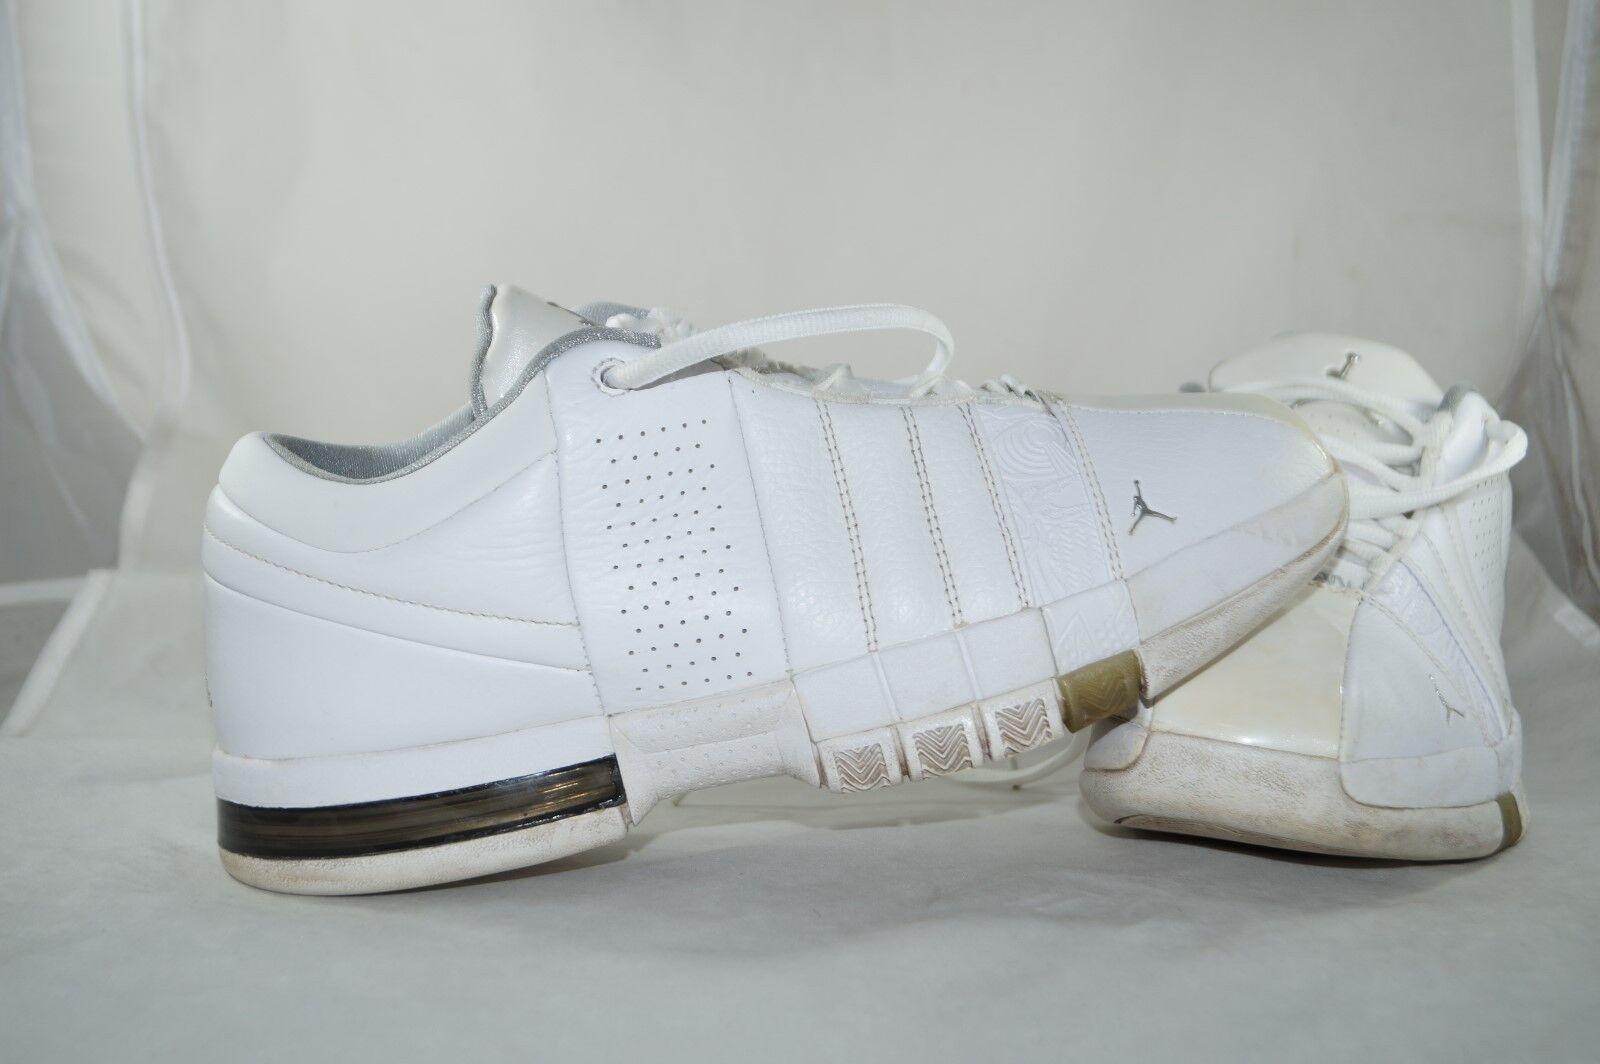 Air Jordan Team Elite Low GR: 42,5 BIANCO Scarpe da pallacanestro | Prese tedesche  | Uomini/Donna Scarpa